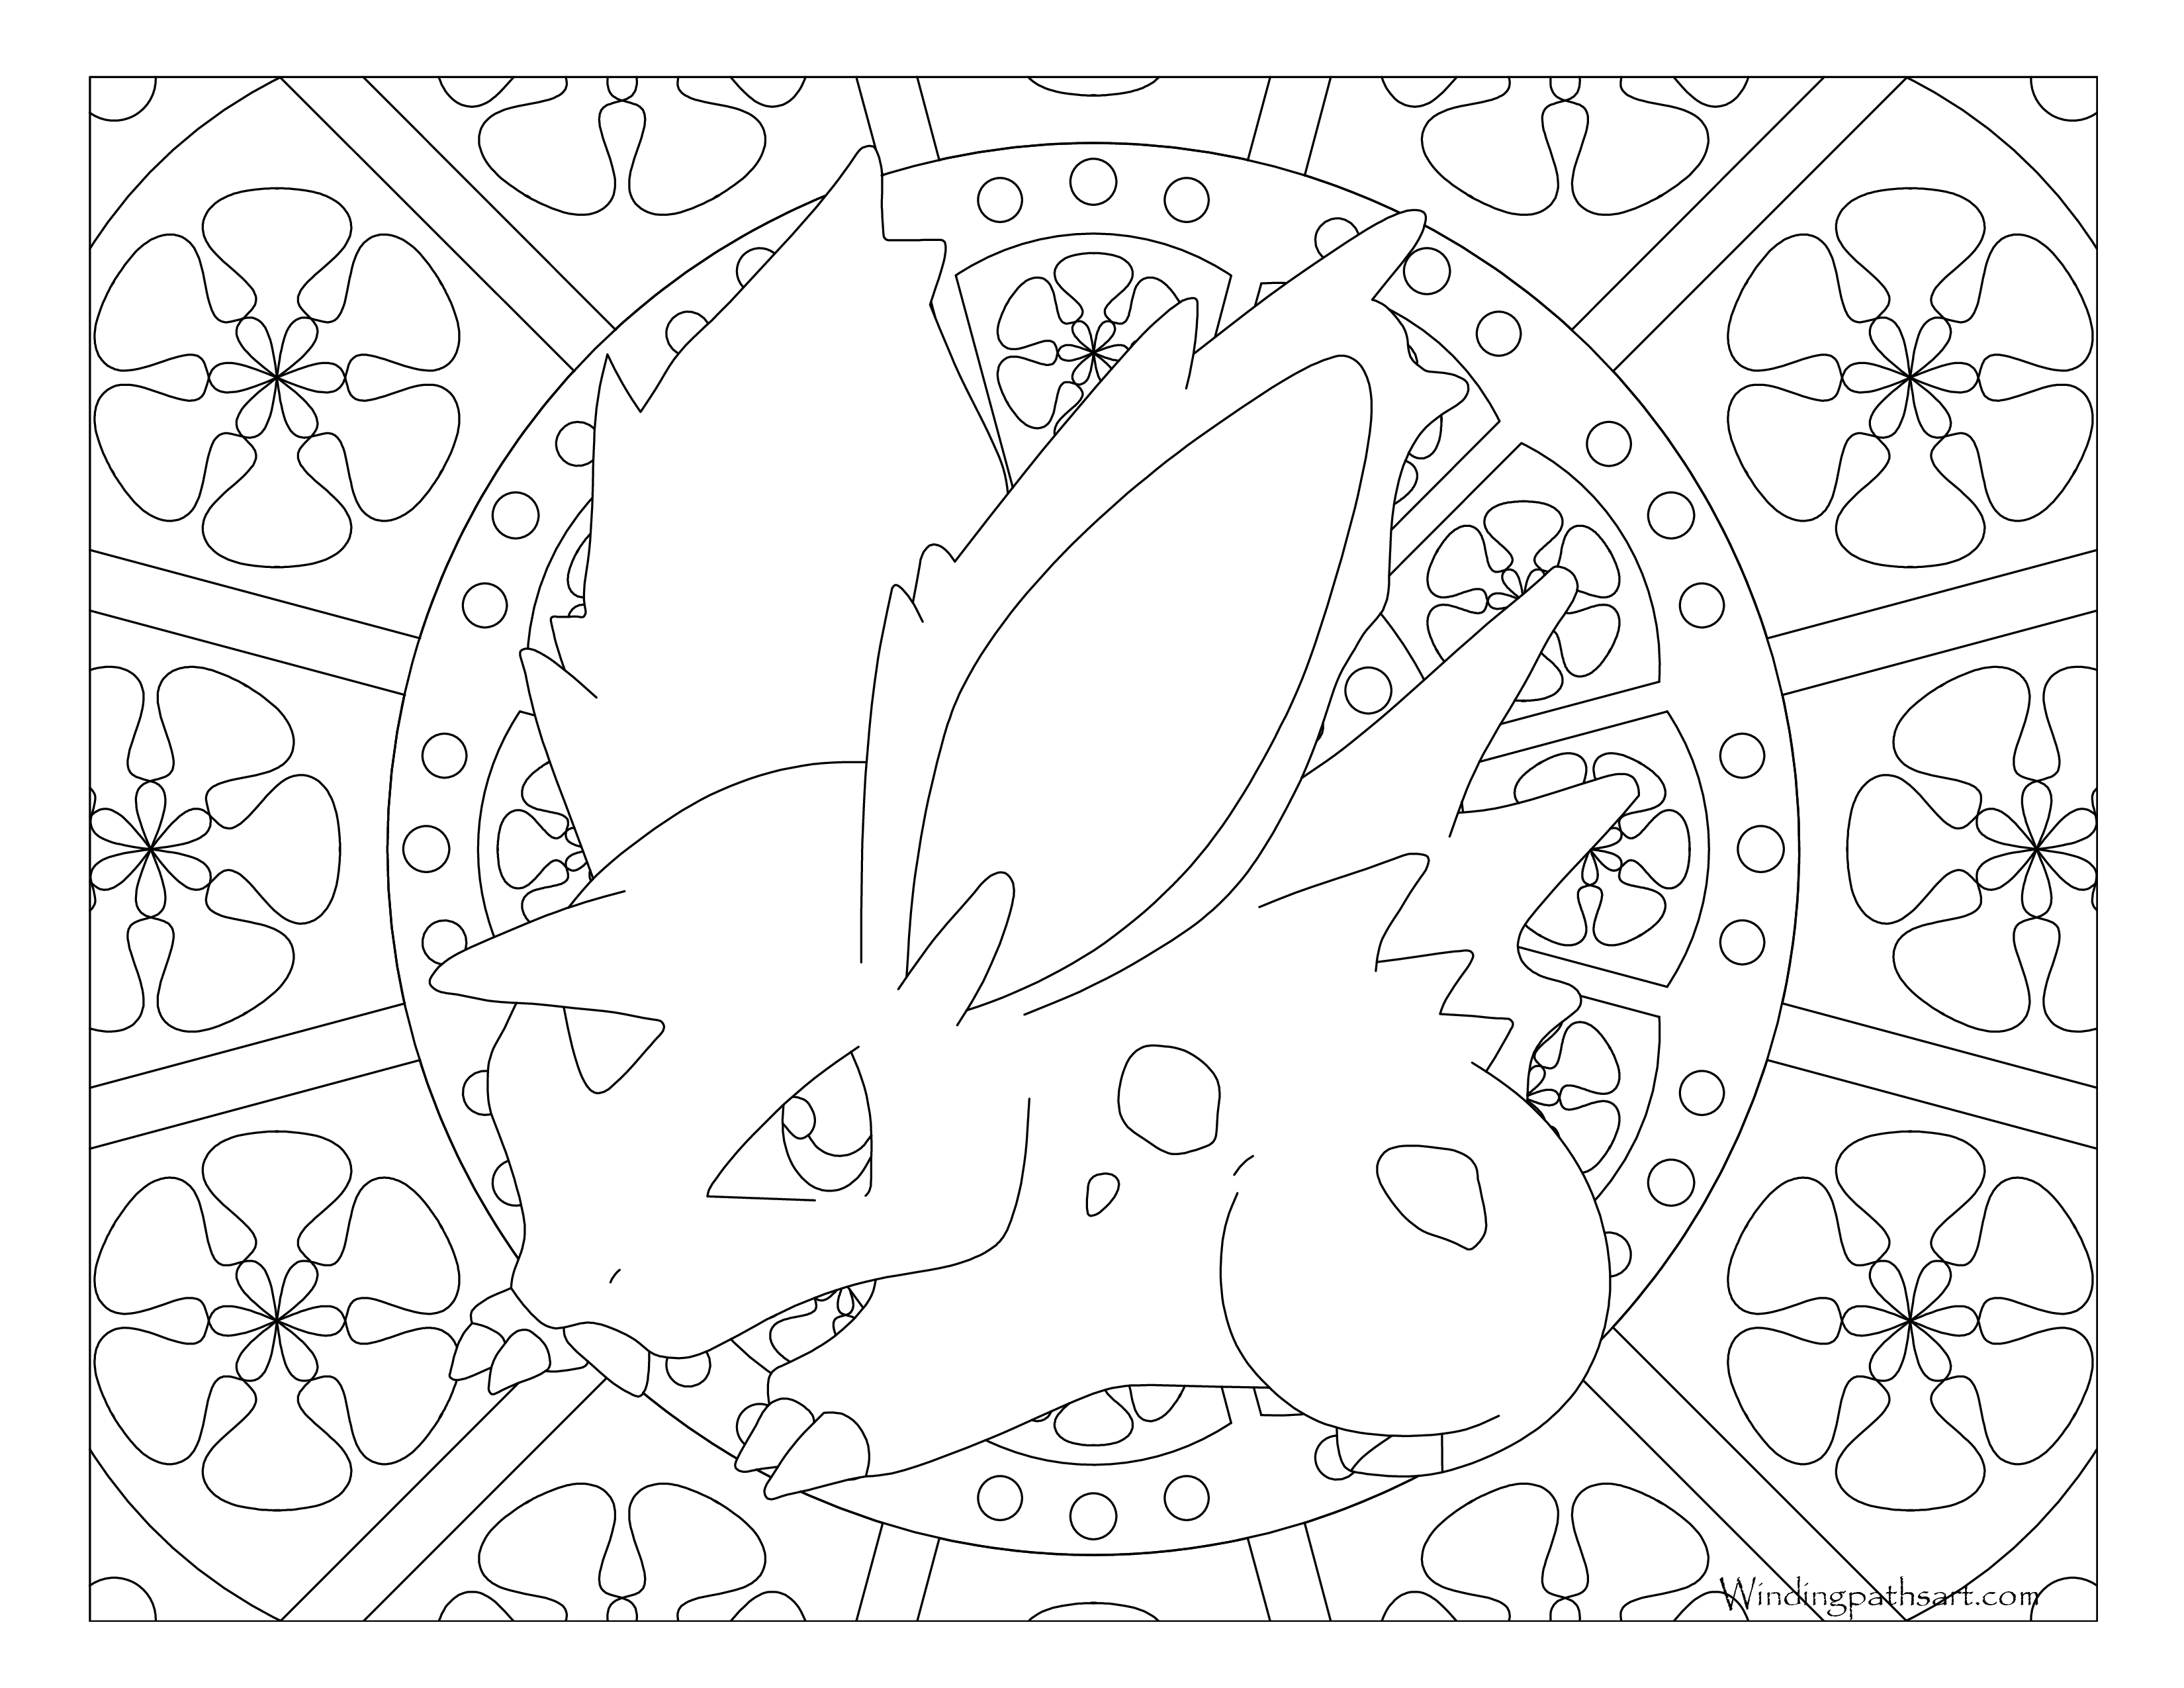 #032 Nidoran ♂ Pokemon Coloring Page · Windingpathsart.com